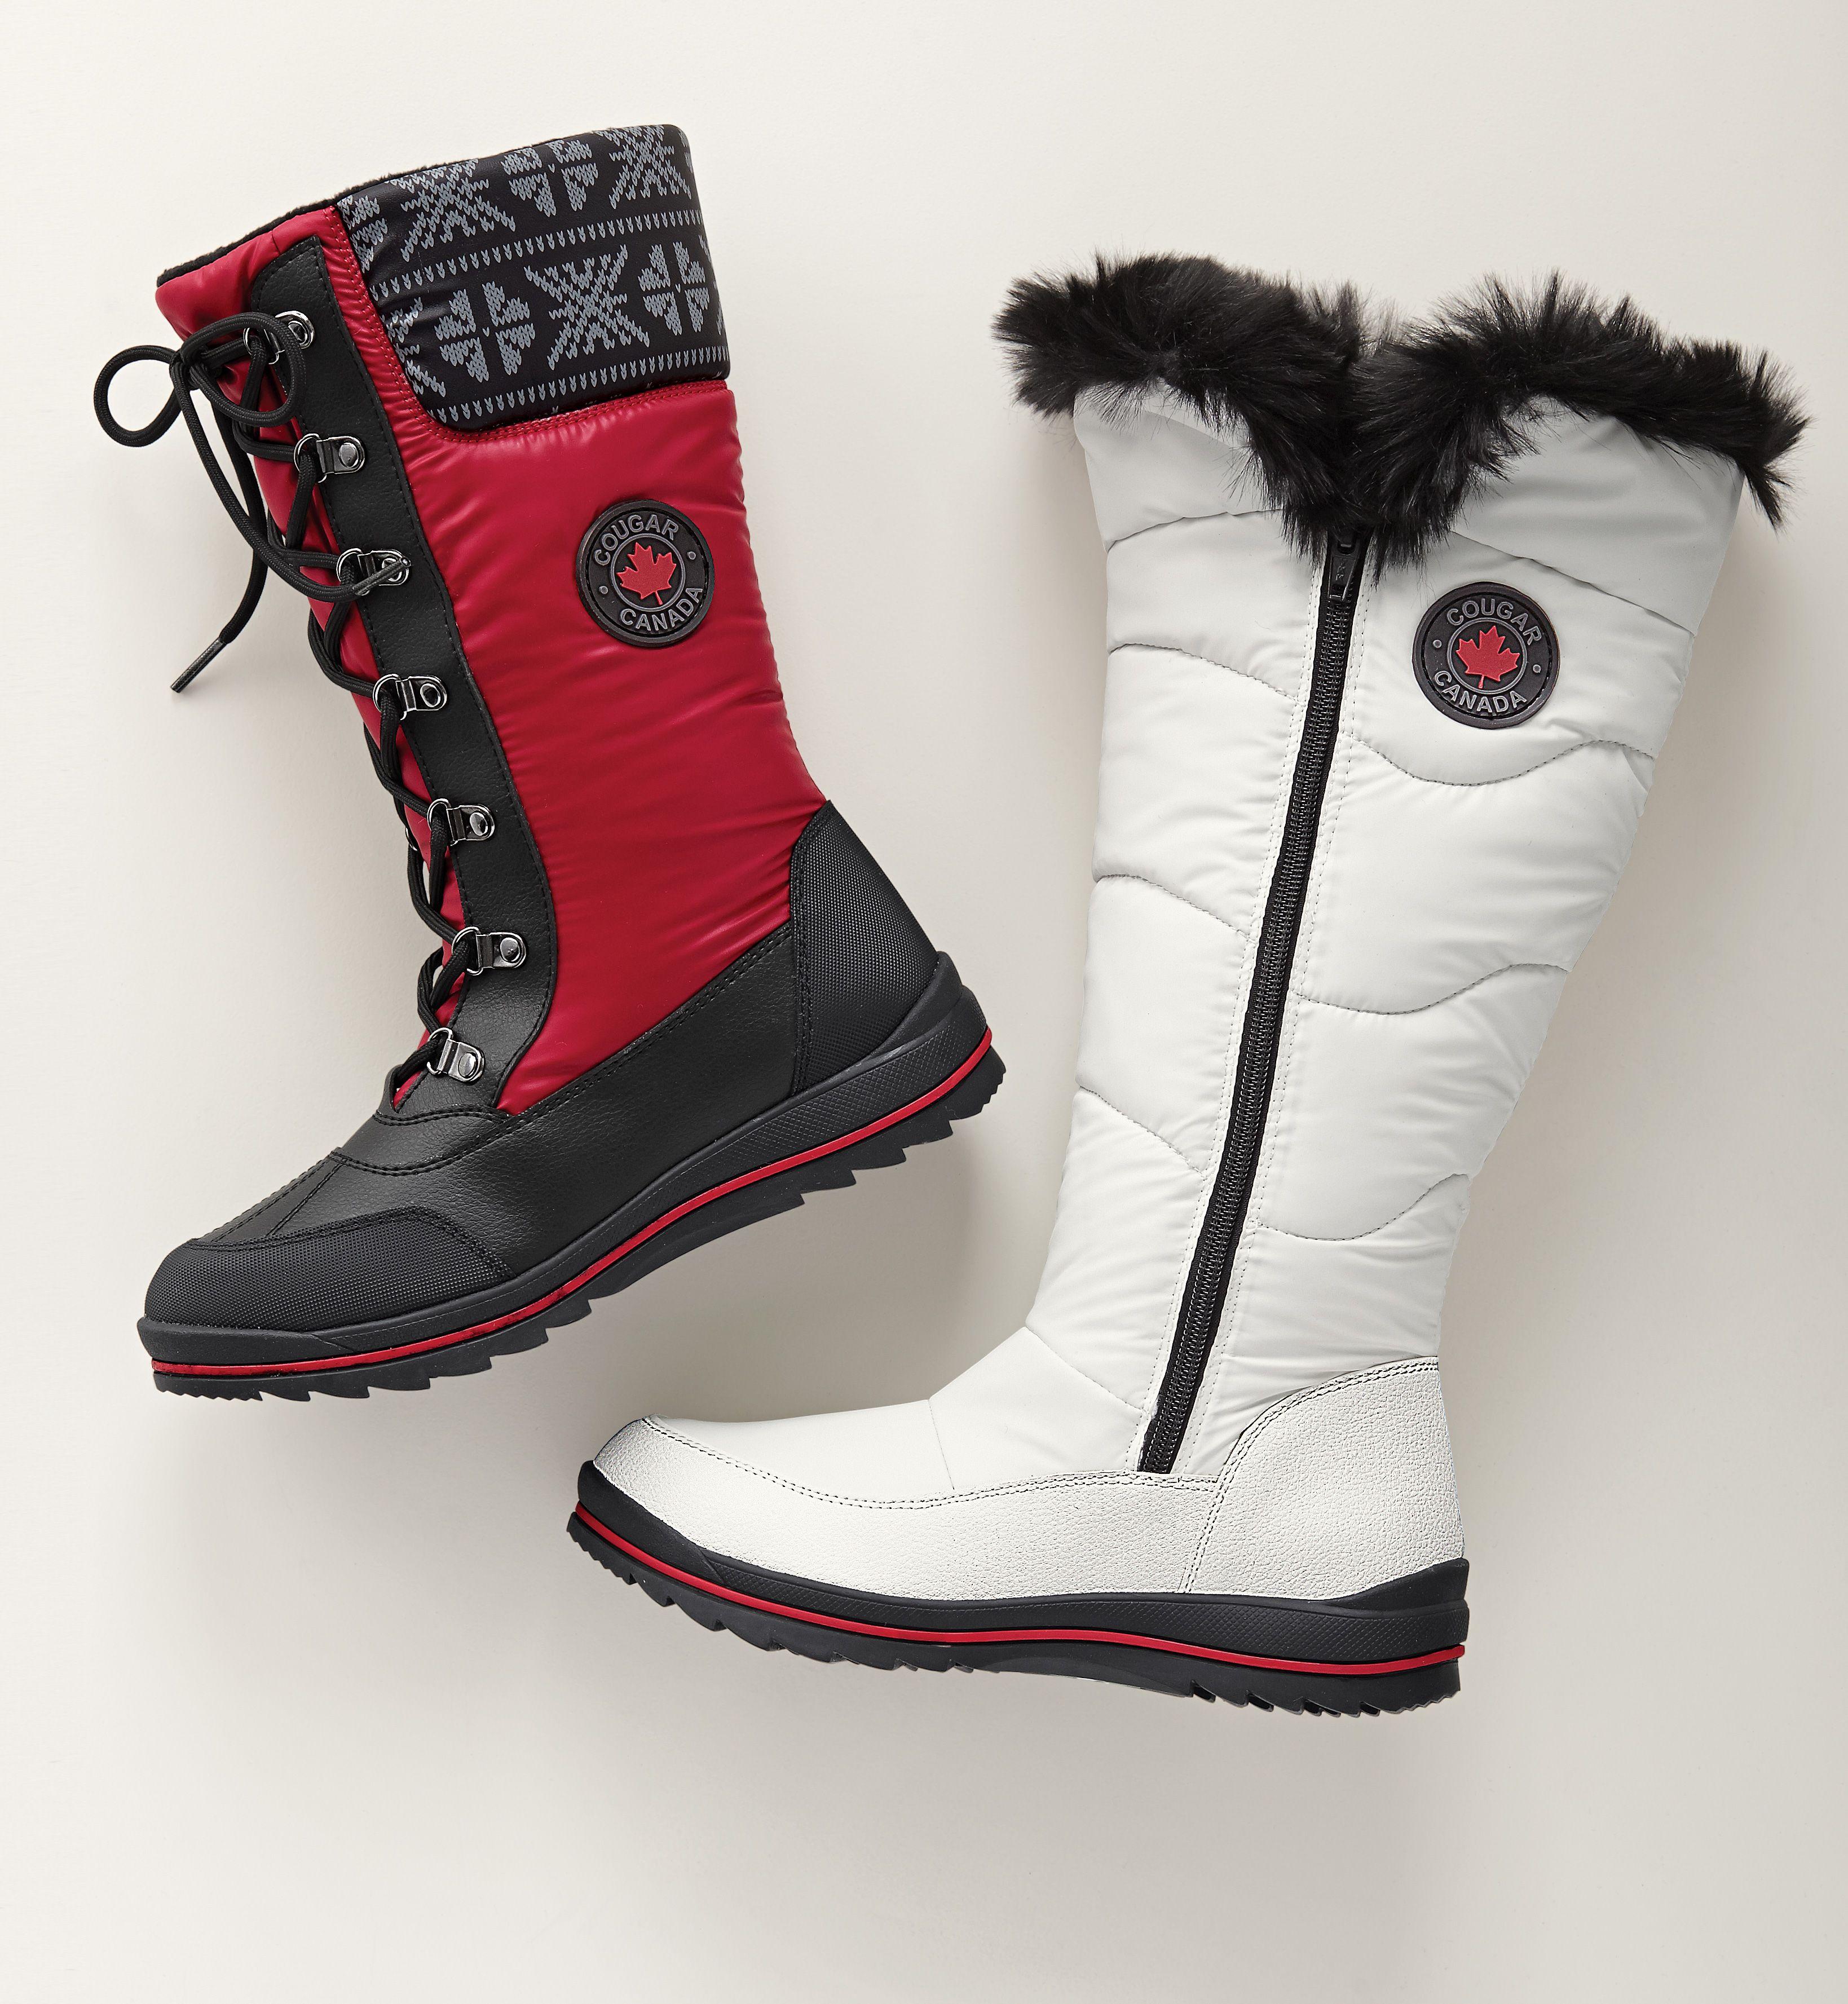 Cougar® Women's 'Beany' Waterproof Winter Boots